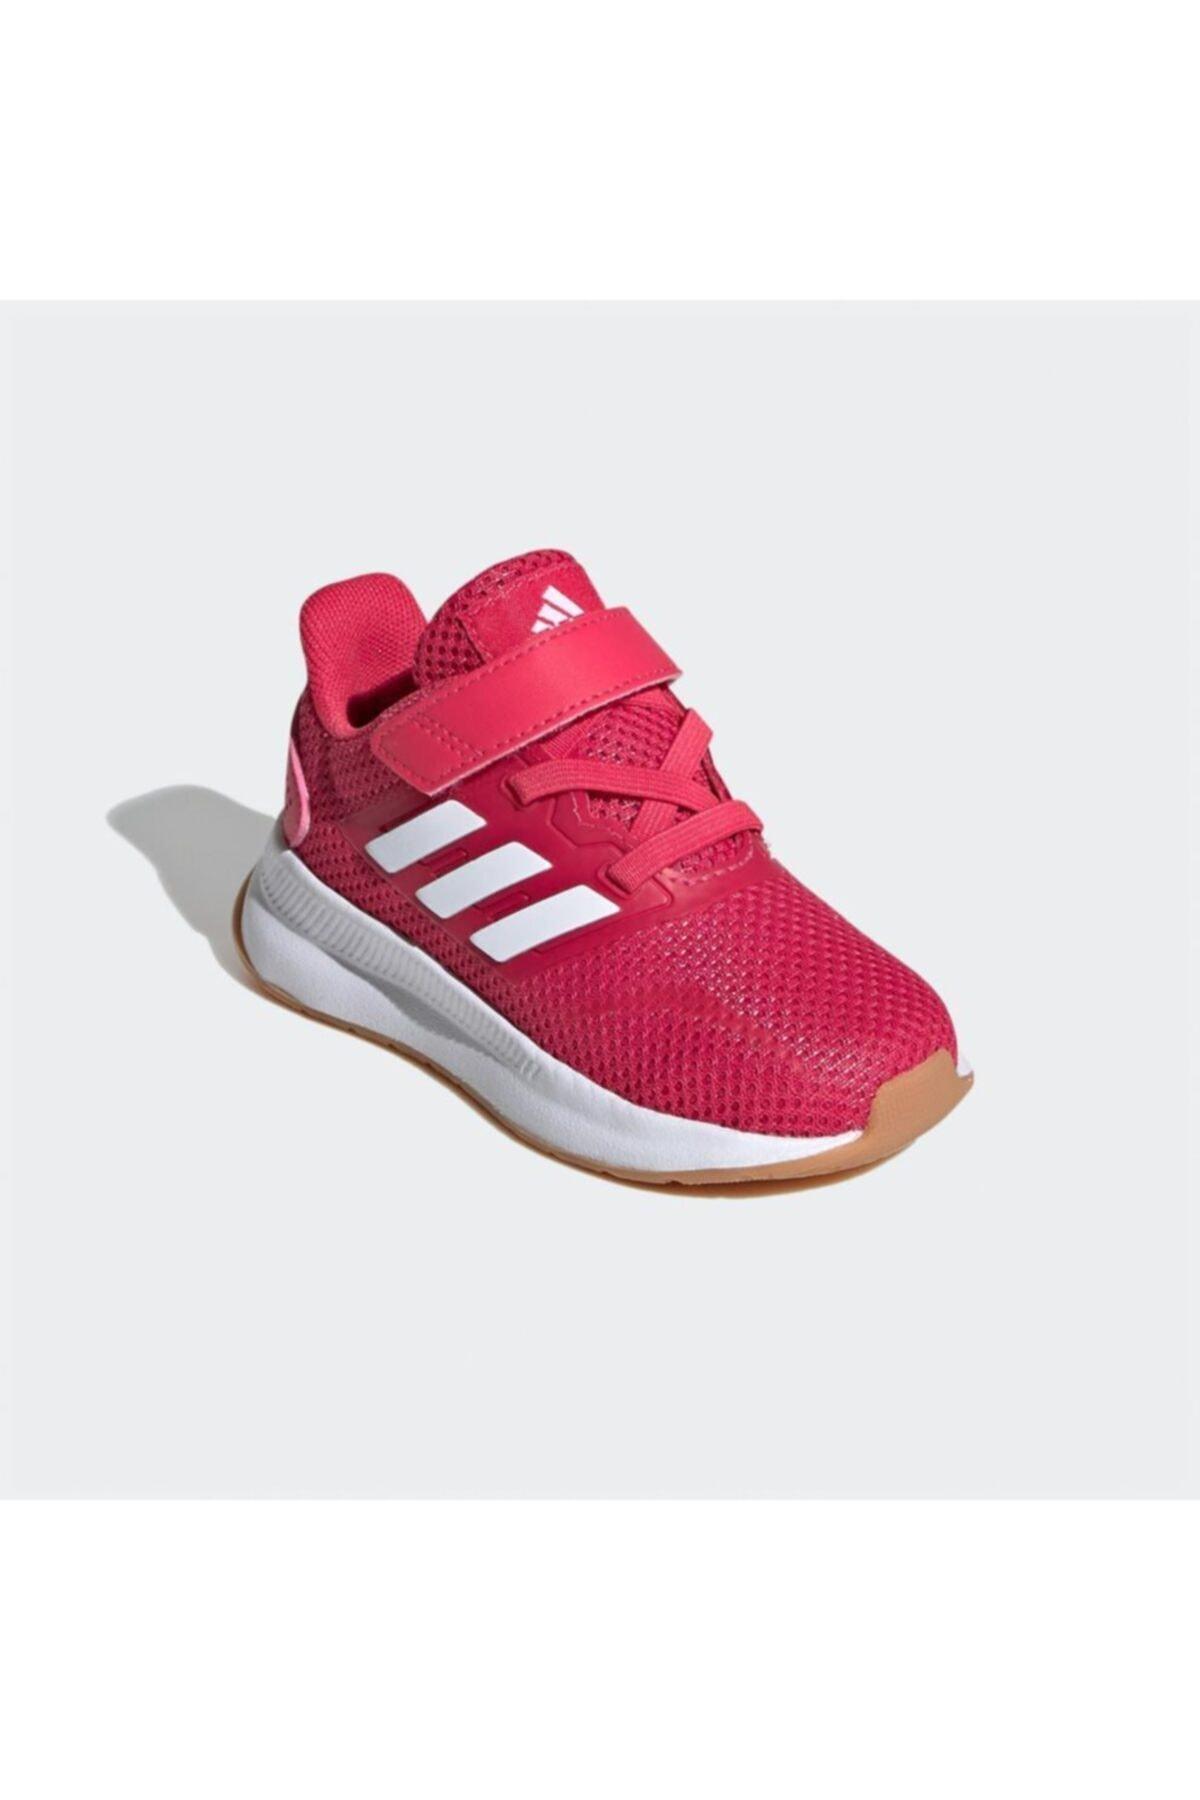 adidas Kız Çocuk Pembe Spor Ayakkabı Fw5156 2